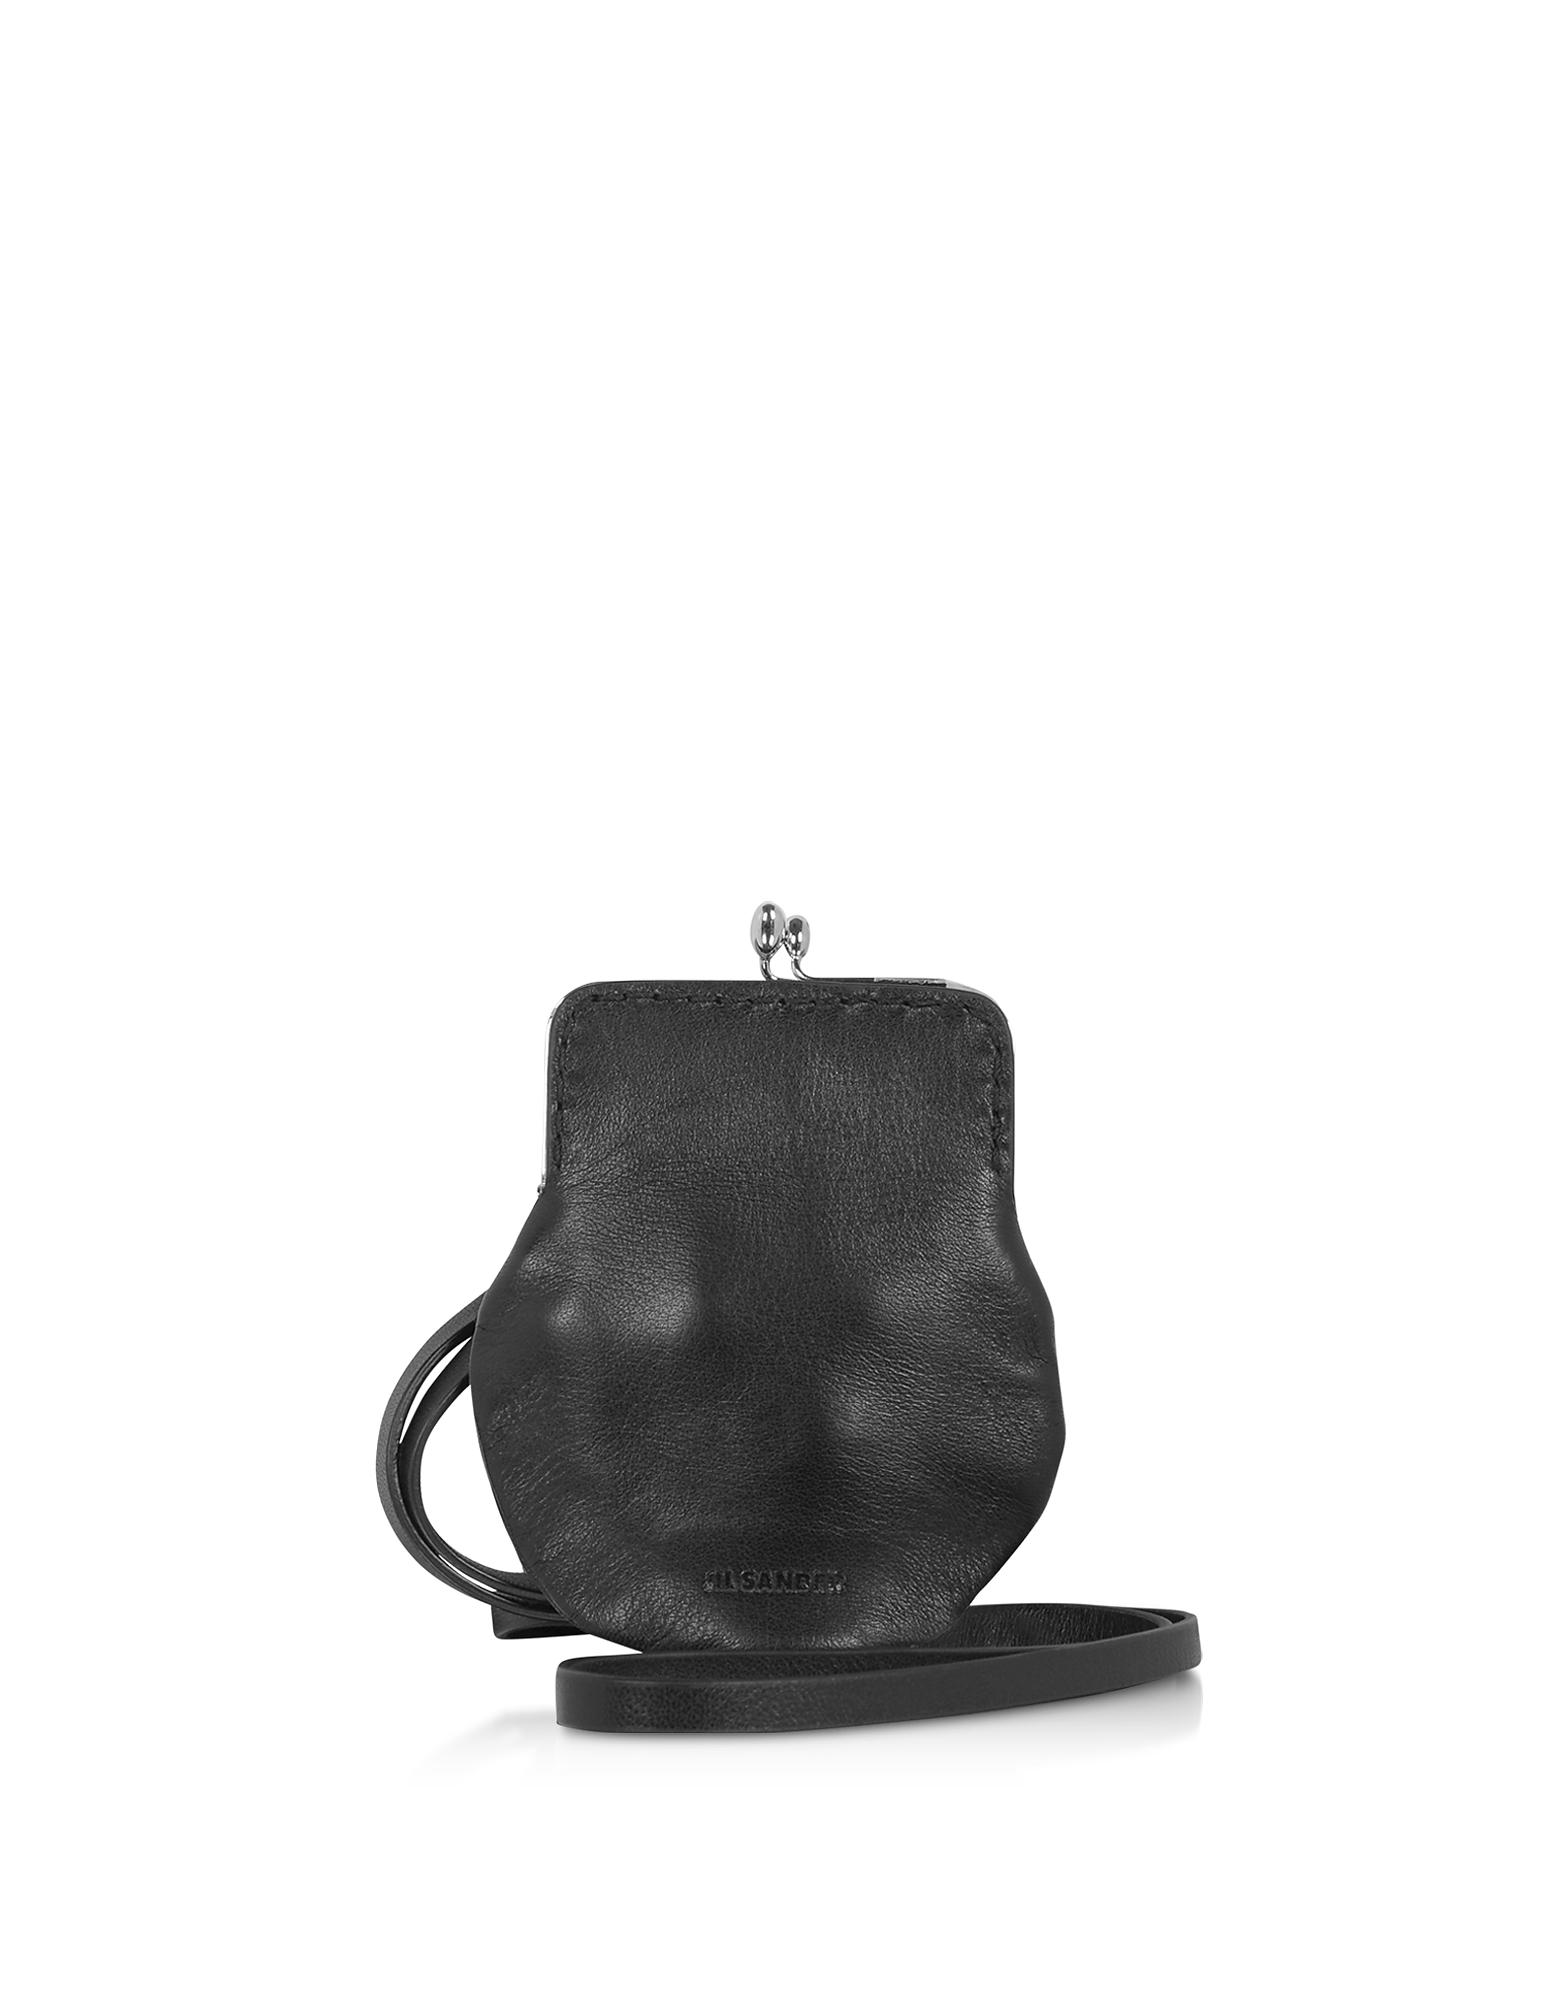 Jil Sander Designer Handbags, Goji Frame Purse Micro Bag